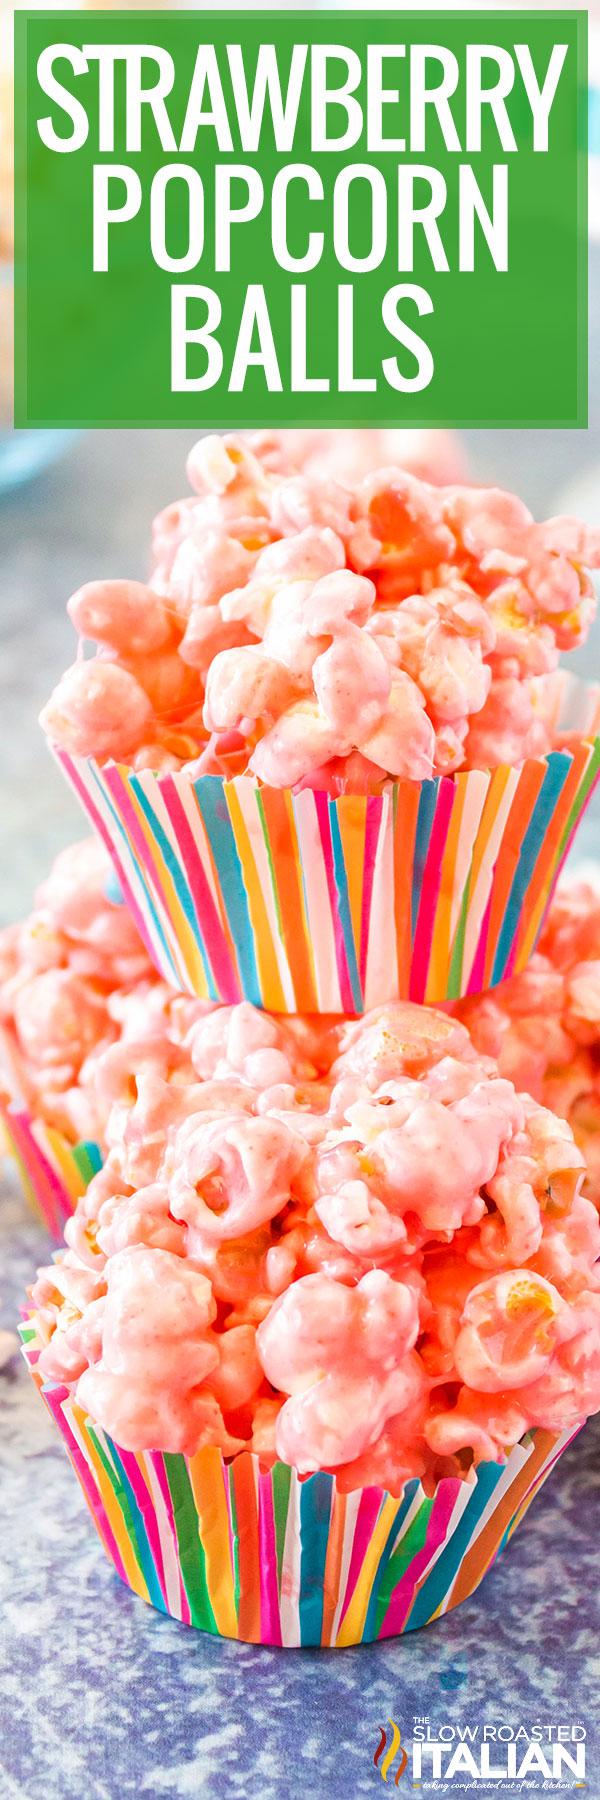 Strawberry Popcorn Ball Recipe closeup